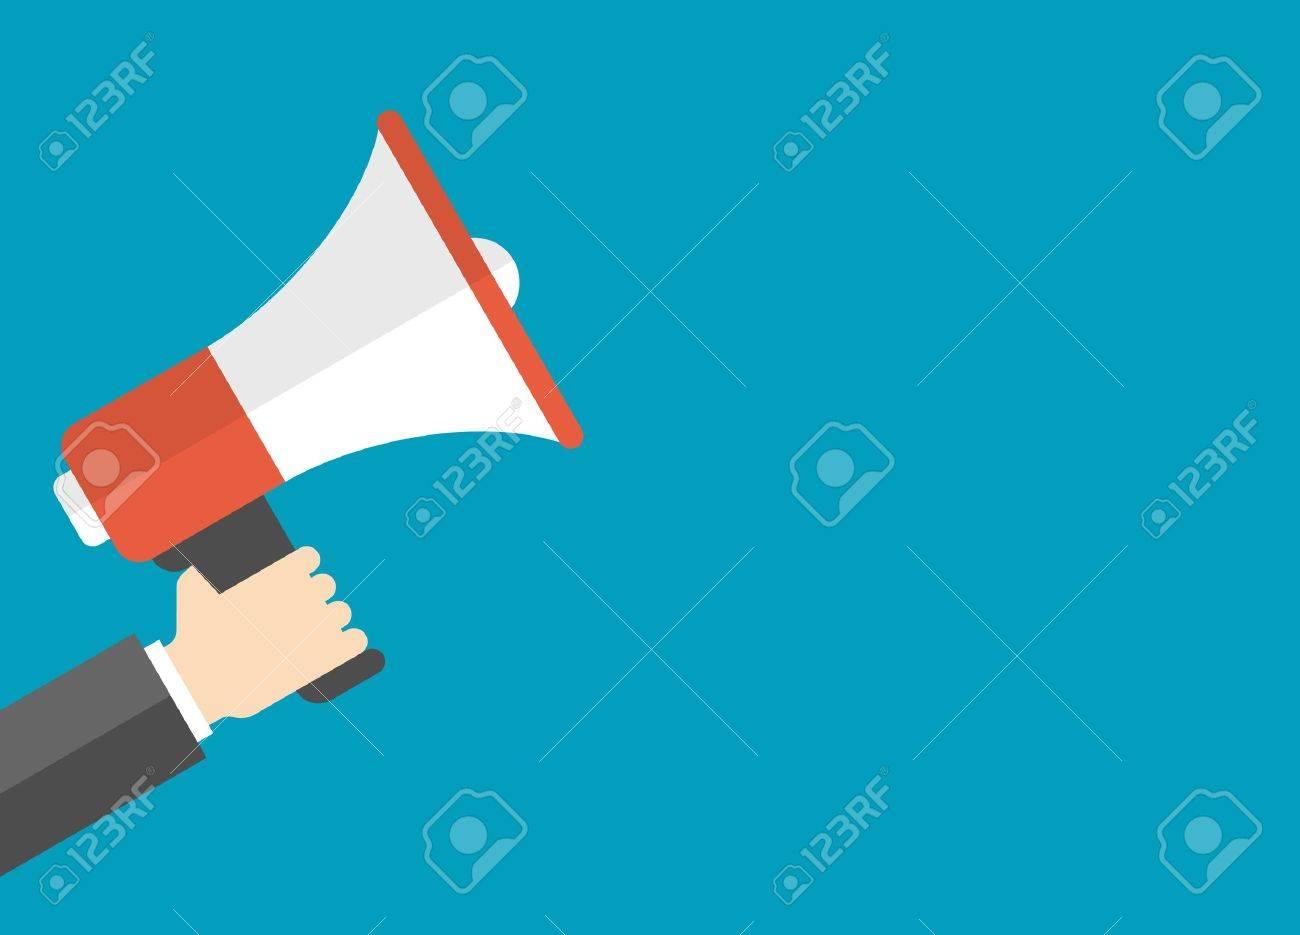 Flat design vector business illustration concept Digital marketing business man holding megaphone for website and promotion banners. - 35282145